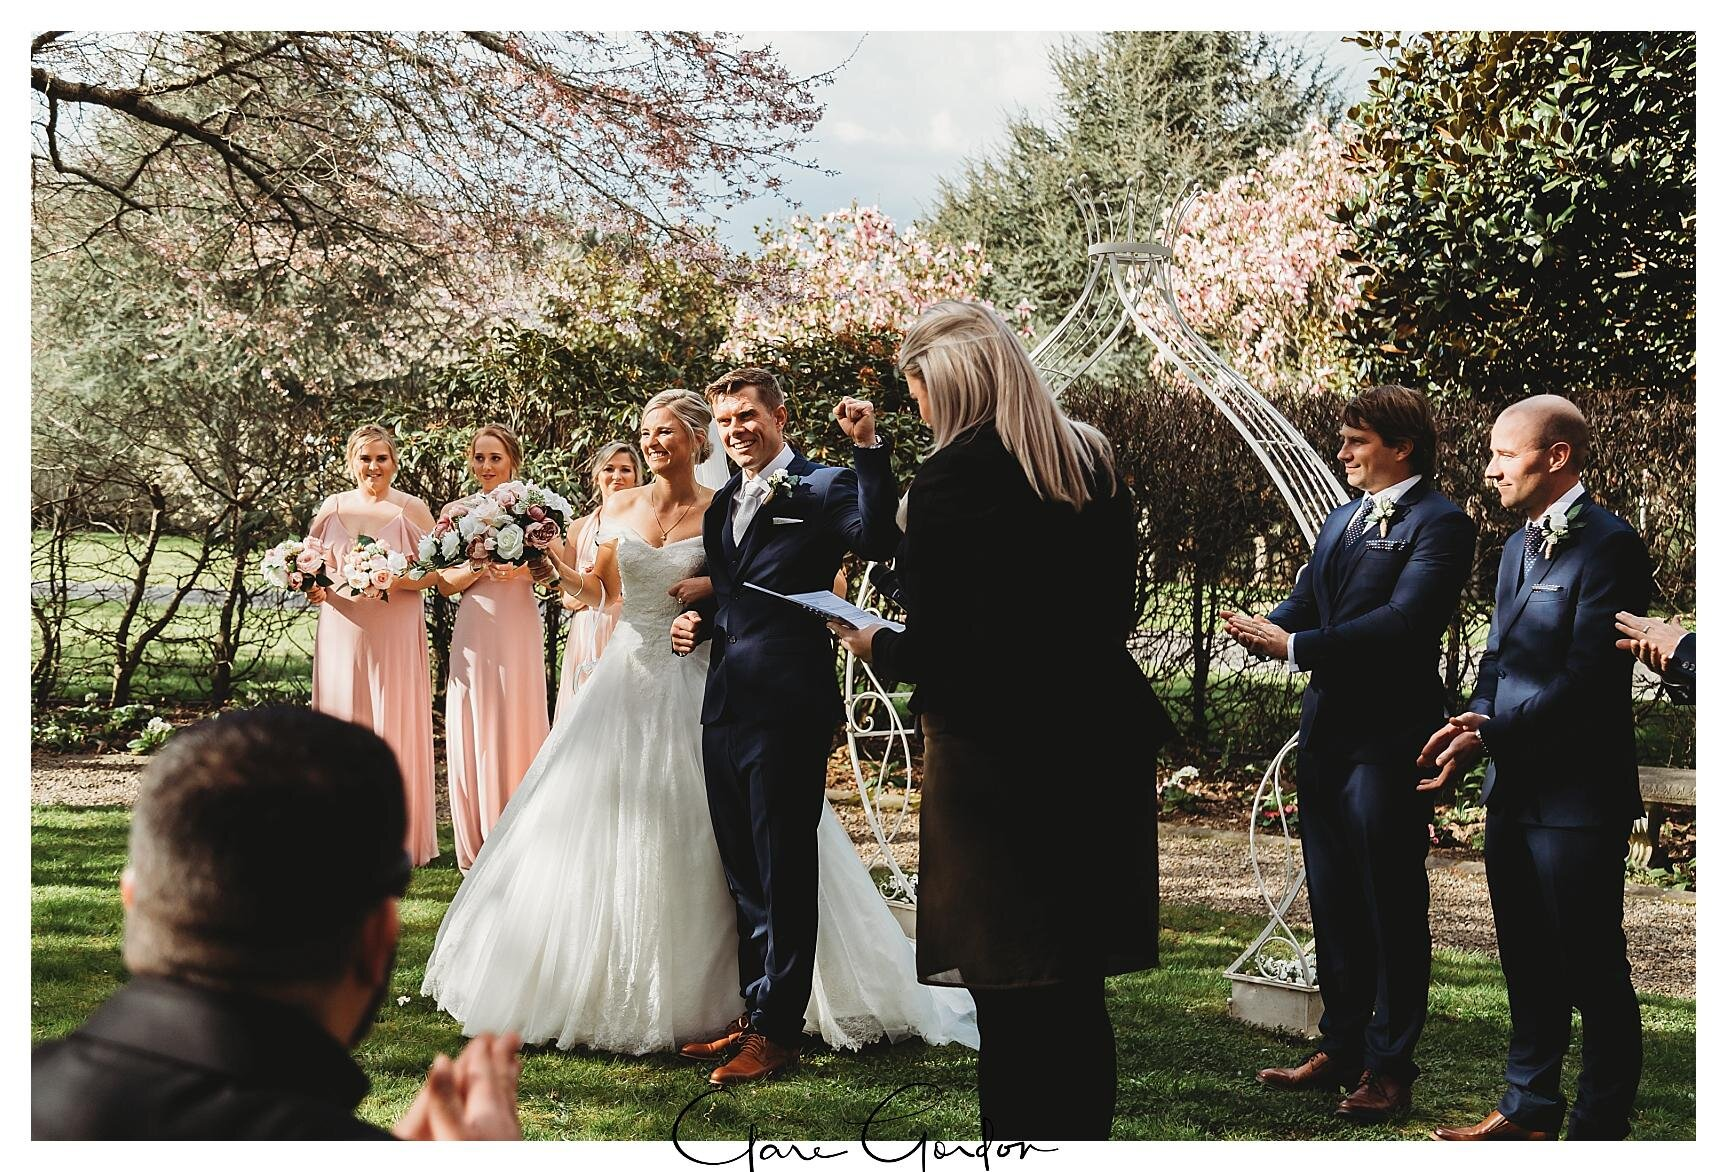 Henley-Hotel-Cherry-blossom-wedding-photos (52).jpg